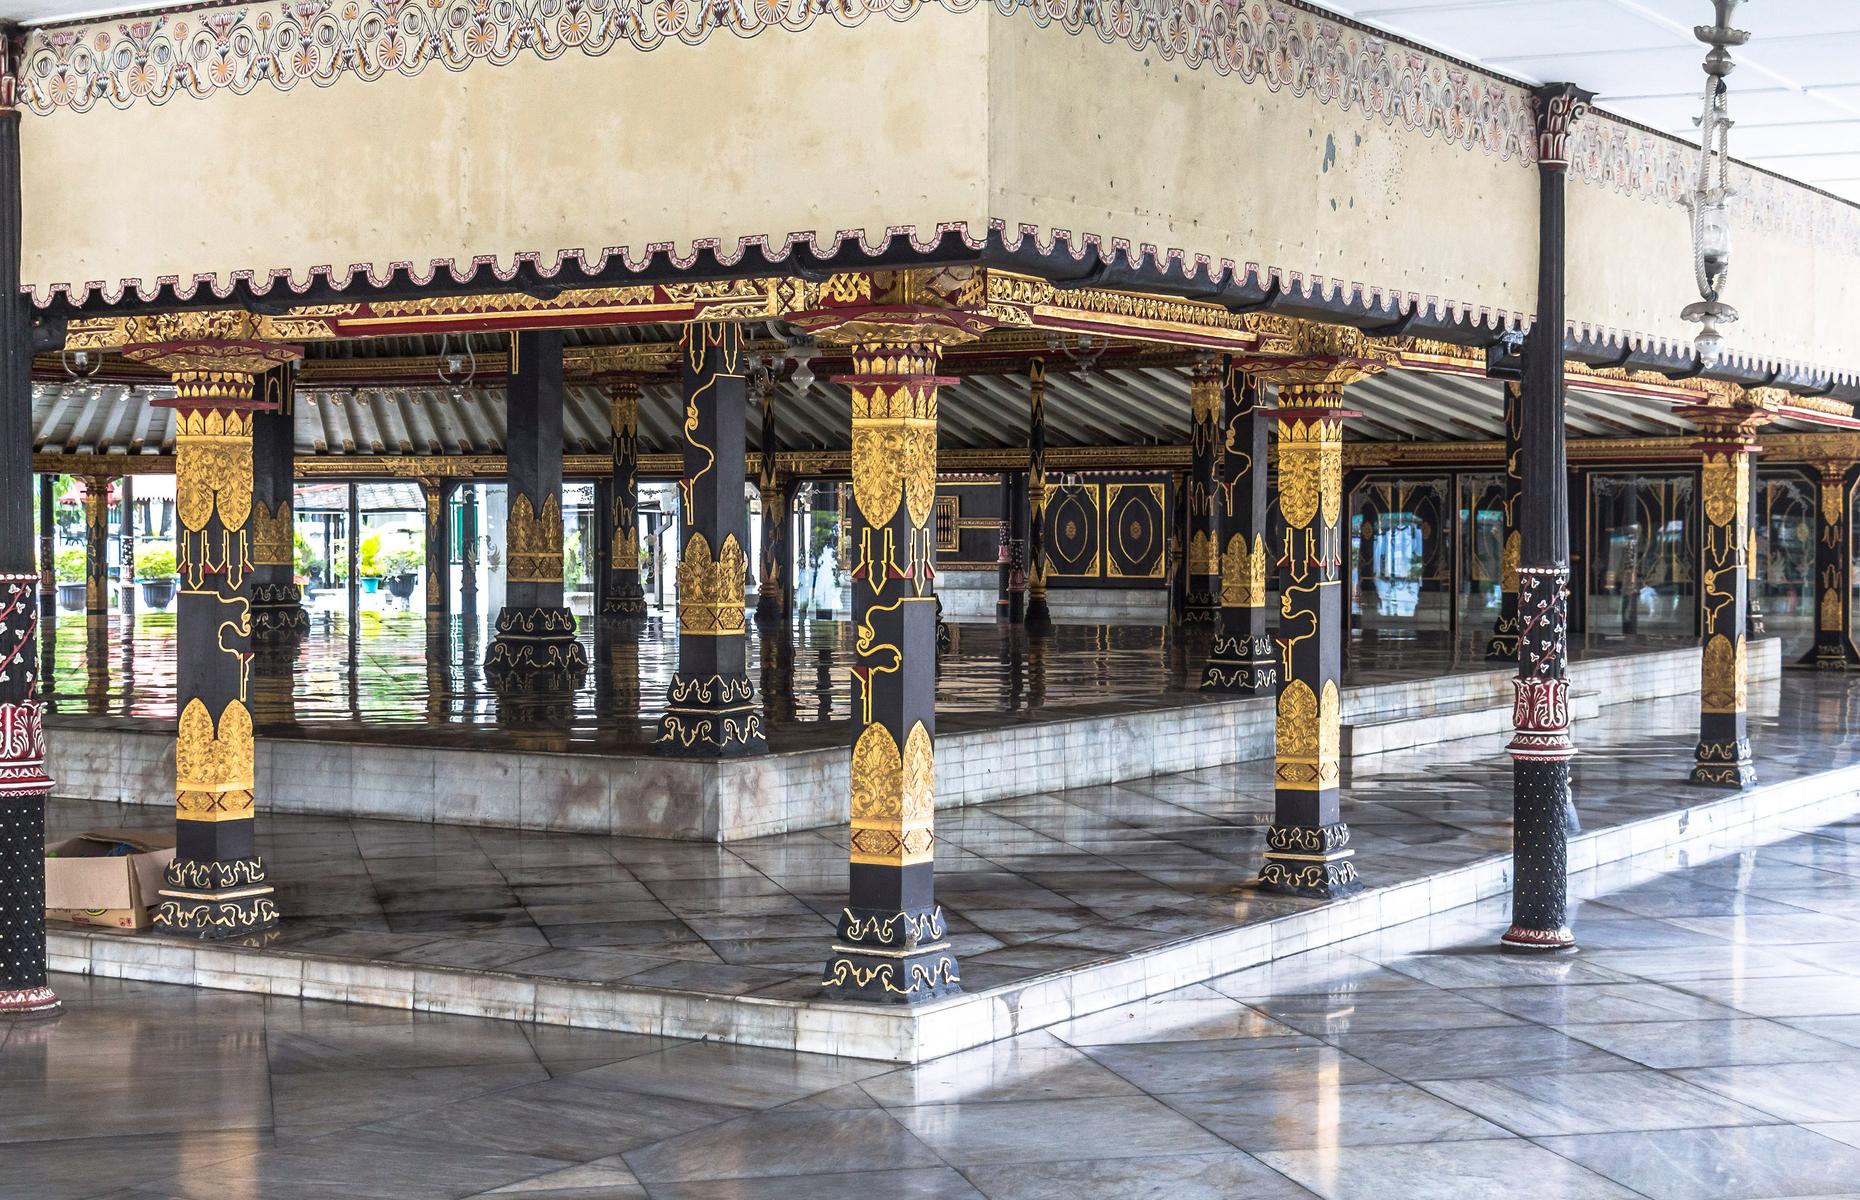 Palace of Yogyakarta (Image: Robin Runck/Shutterstock)